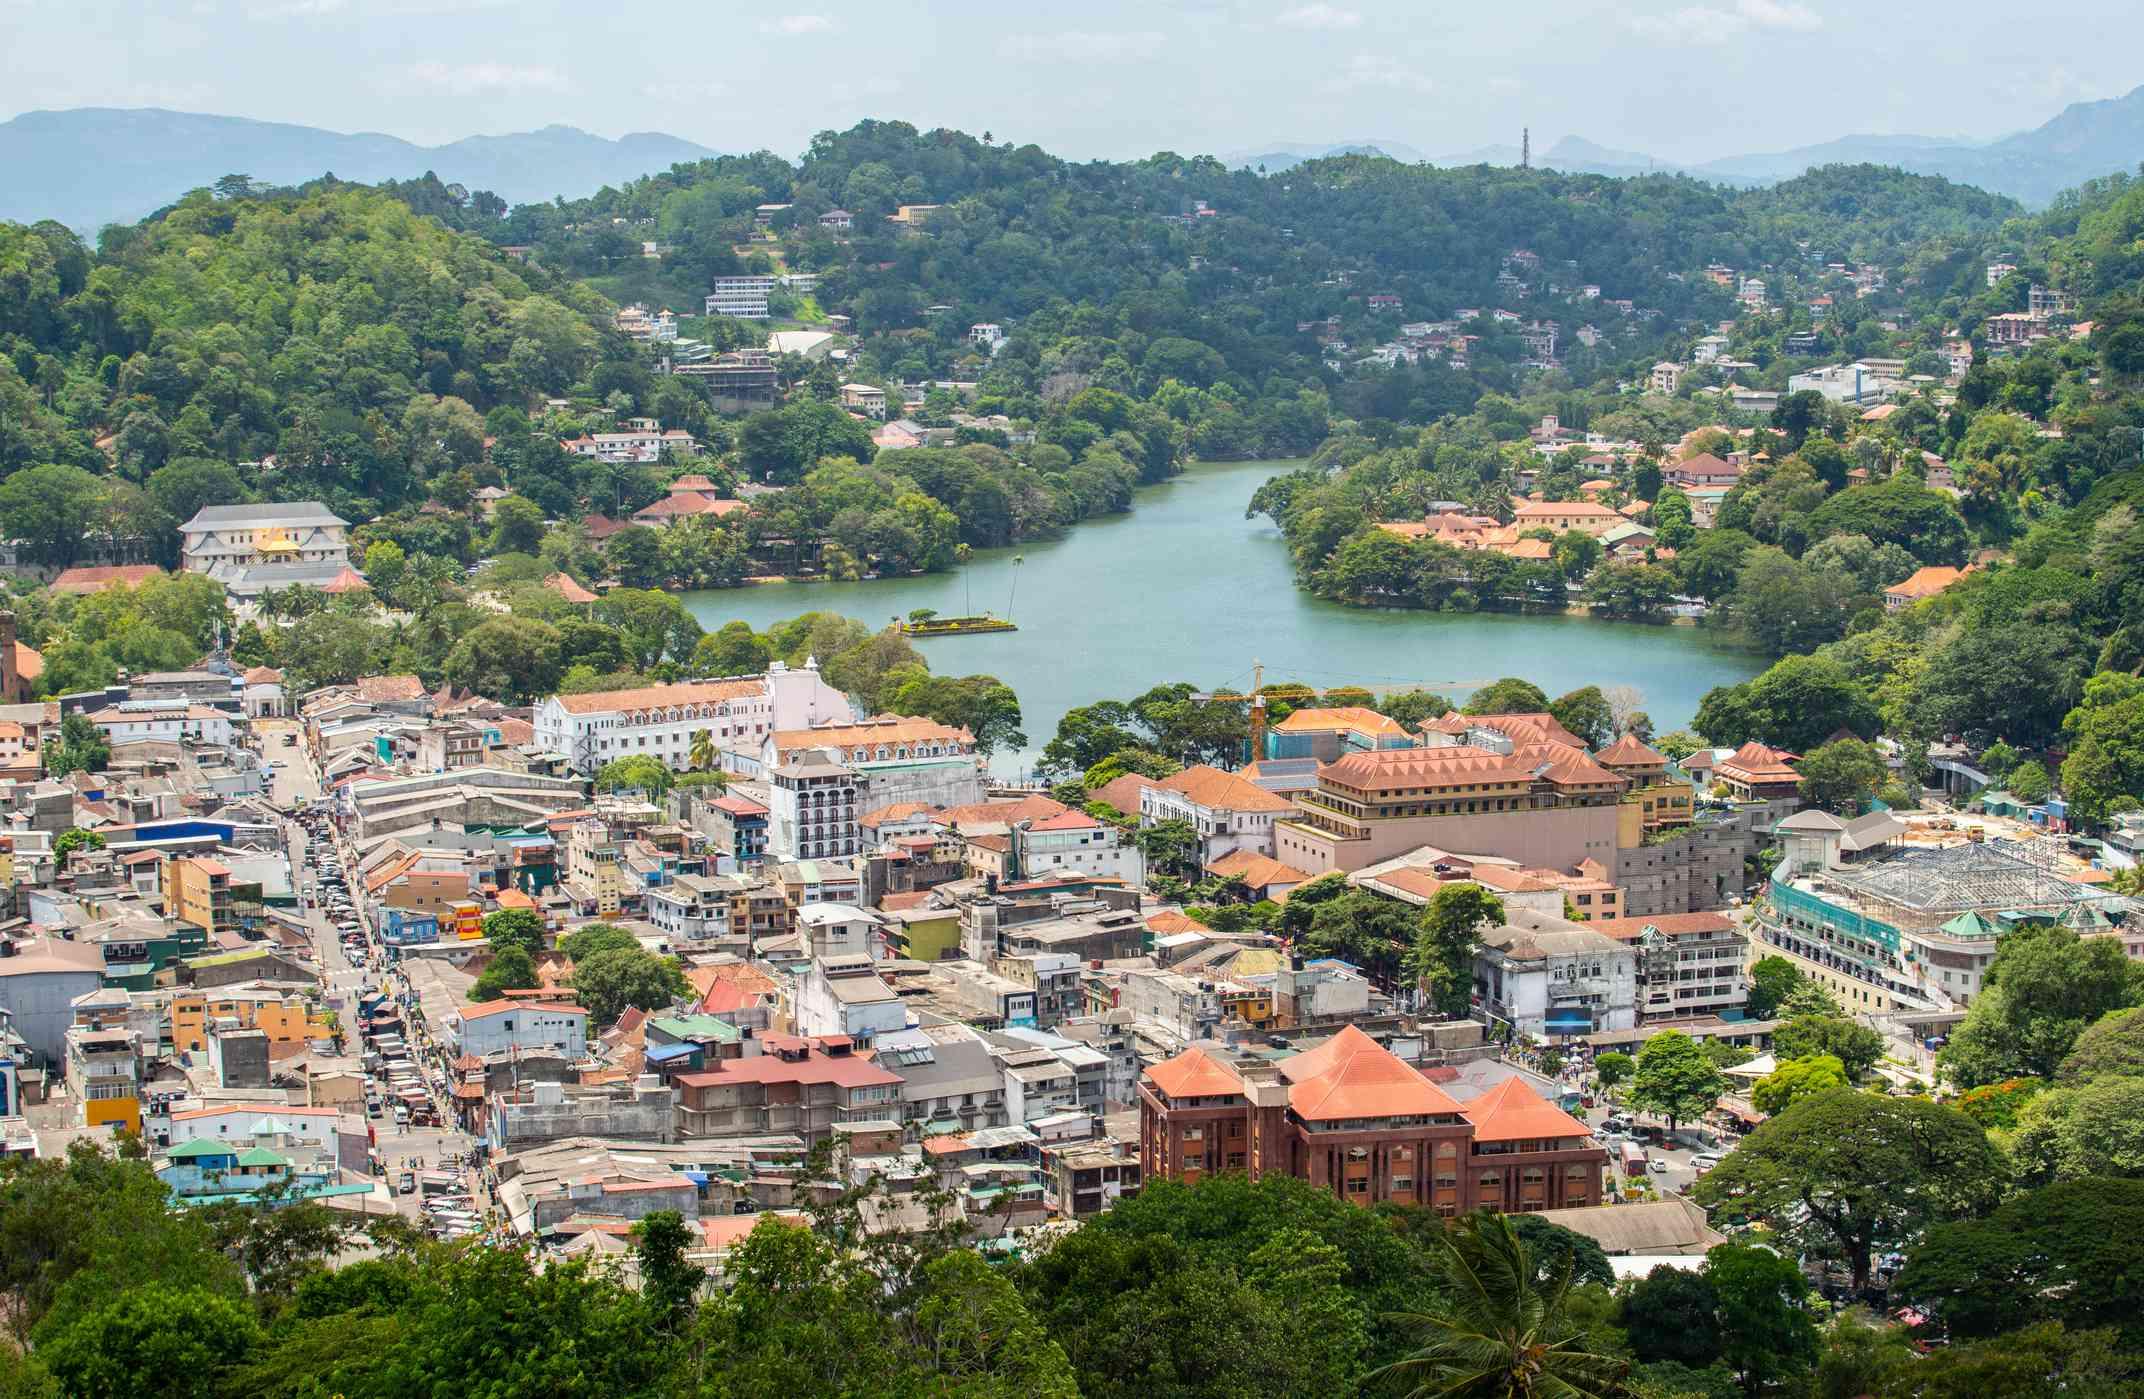 Scenery view of Kandy lake the beautiful stunning place in the heart of Kandy city, Sri Lanka.